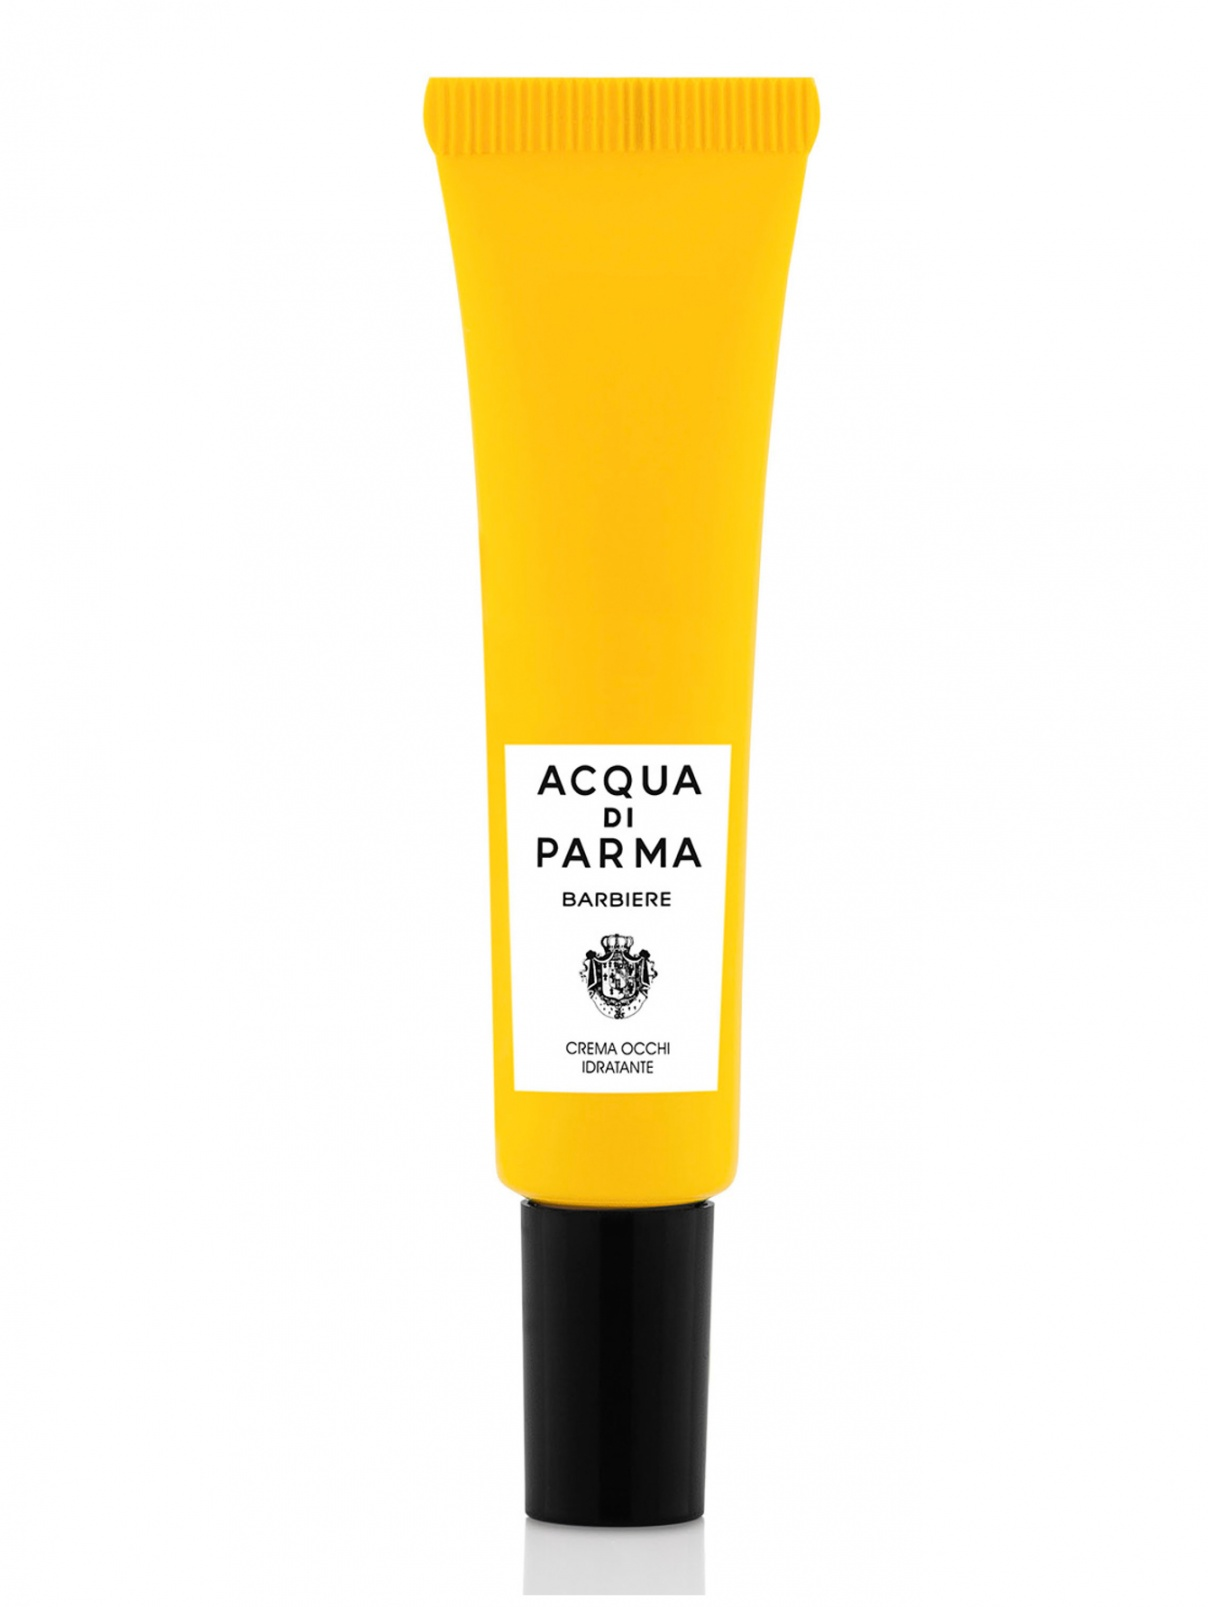 Увлажняющий крем для глаз 15 мл Barbiere Acqua di Parma  –  Общий вид